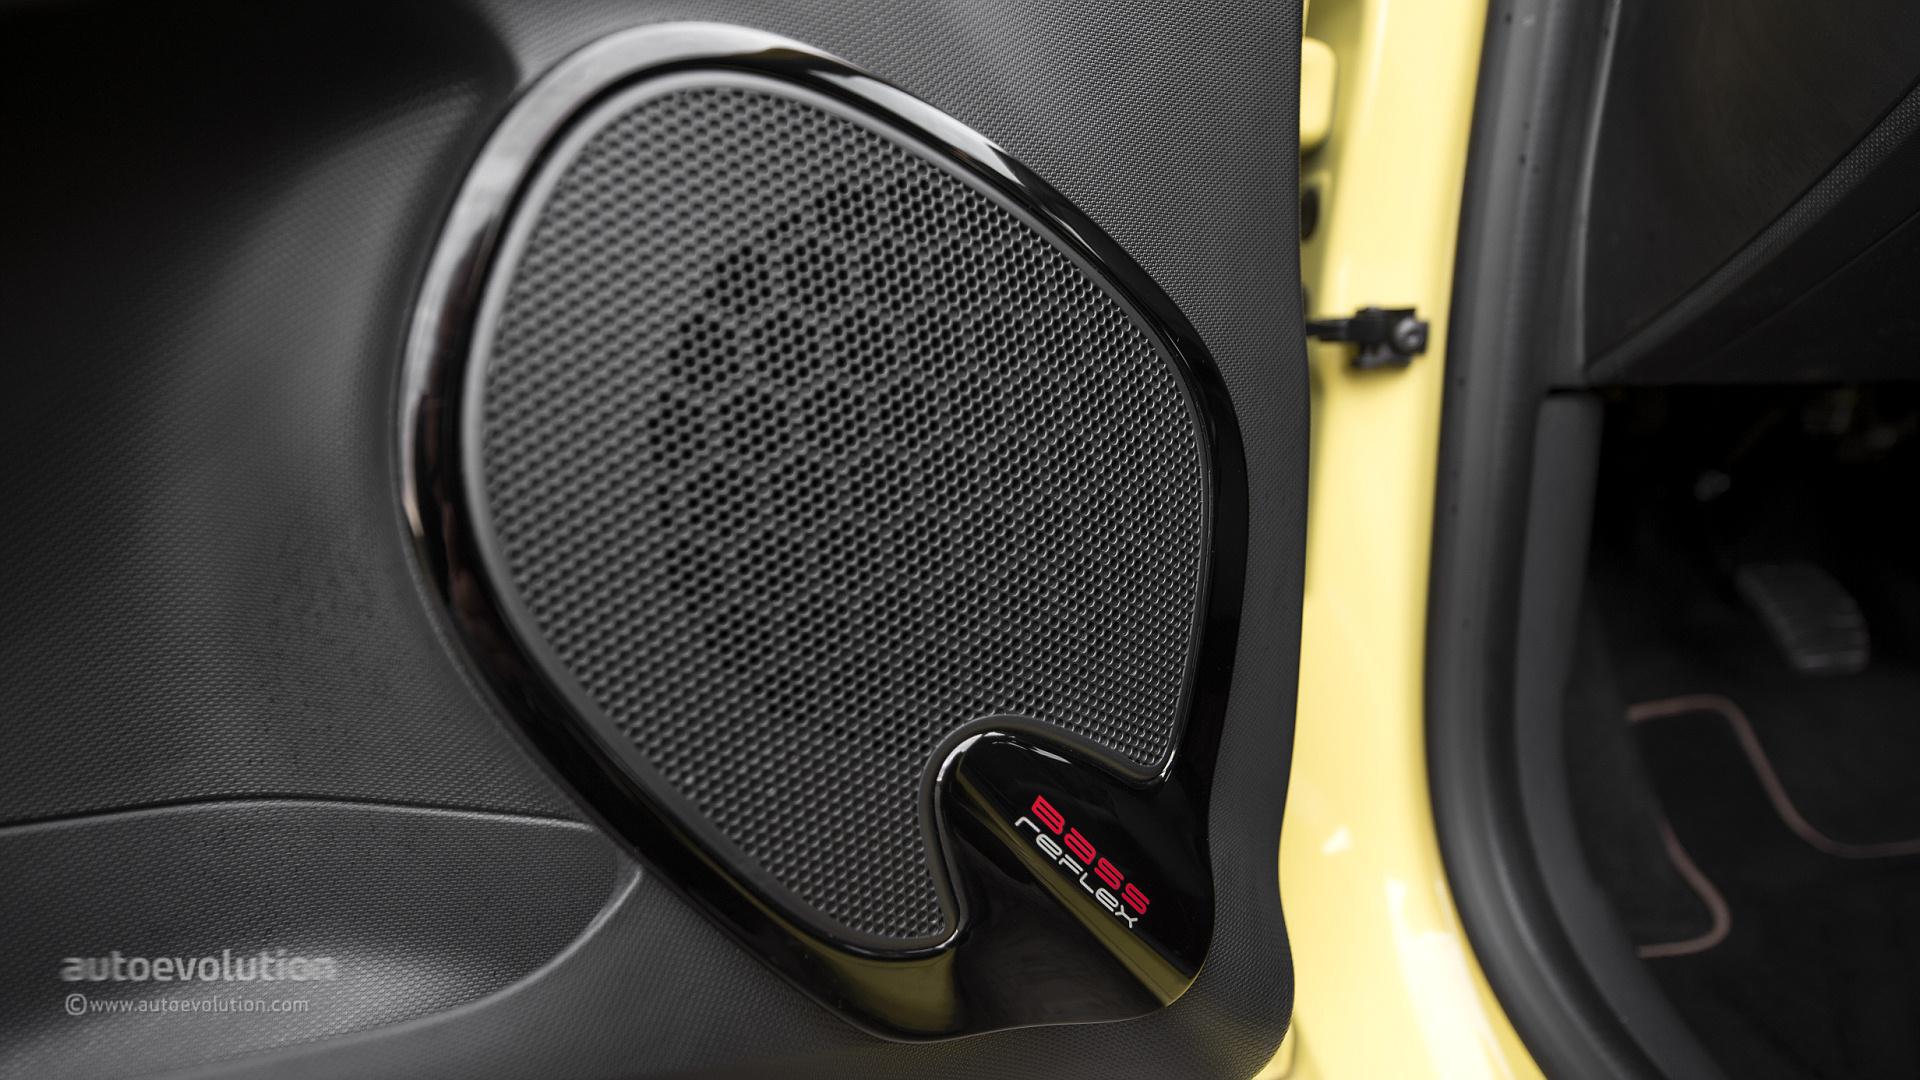 Renault Clio 0 9 Tce Review Autoevolution